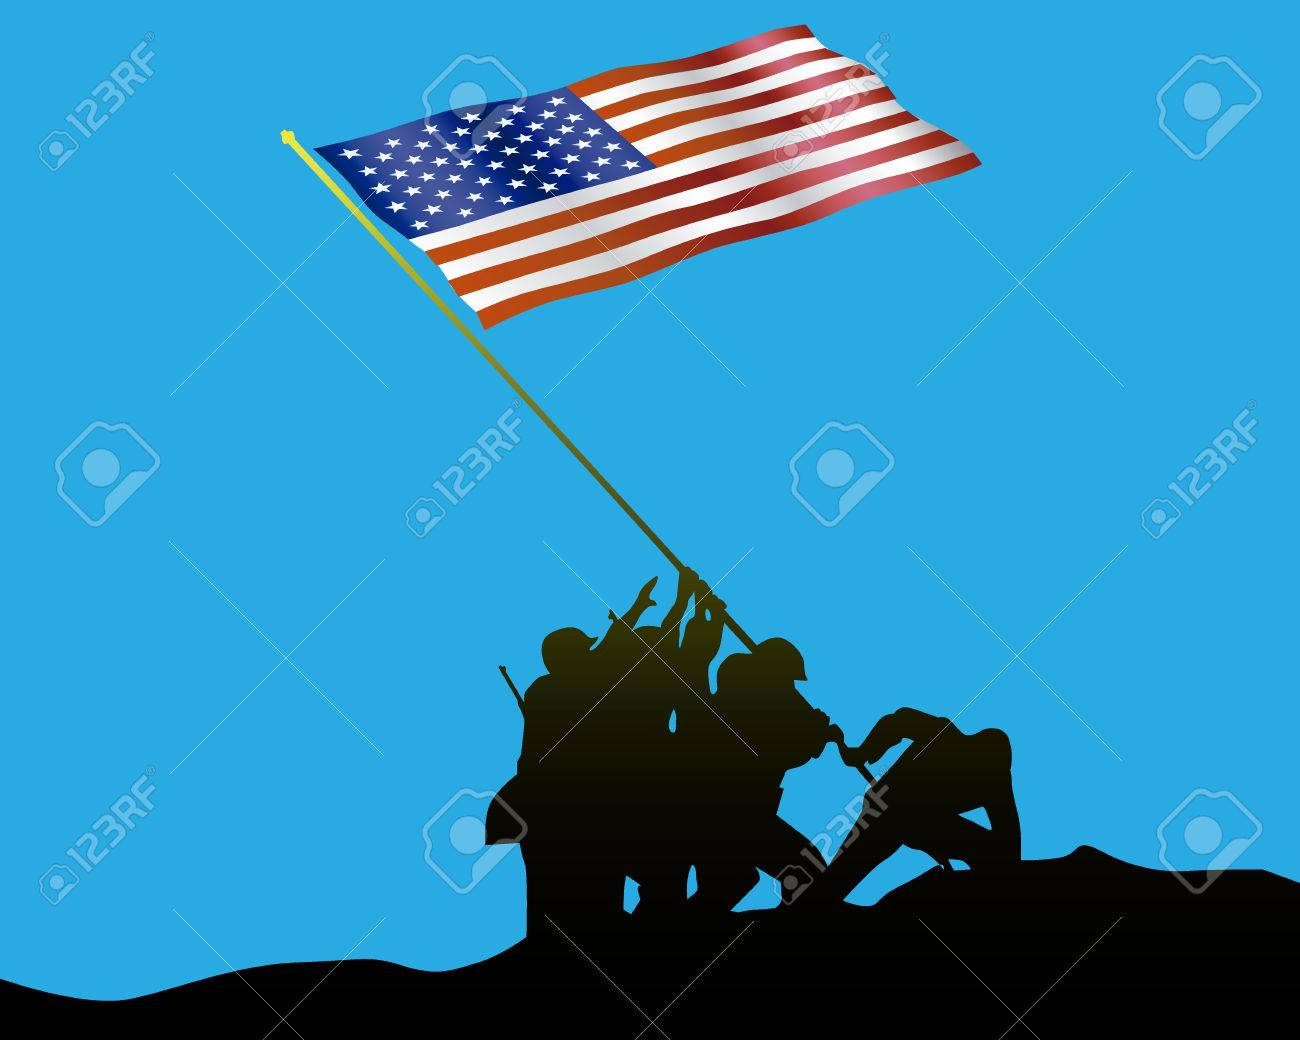 Raising The Flag On Iwo Jima On A Blue Background Royalty Free